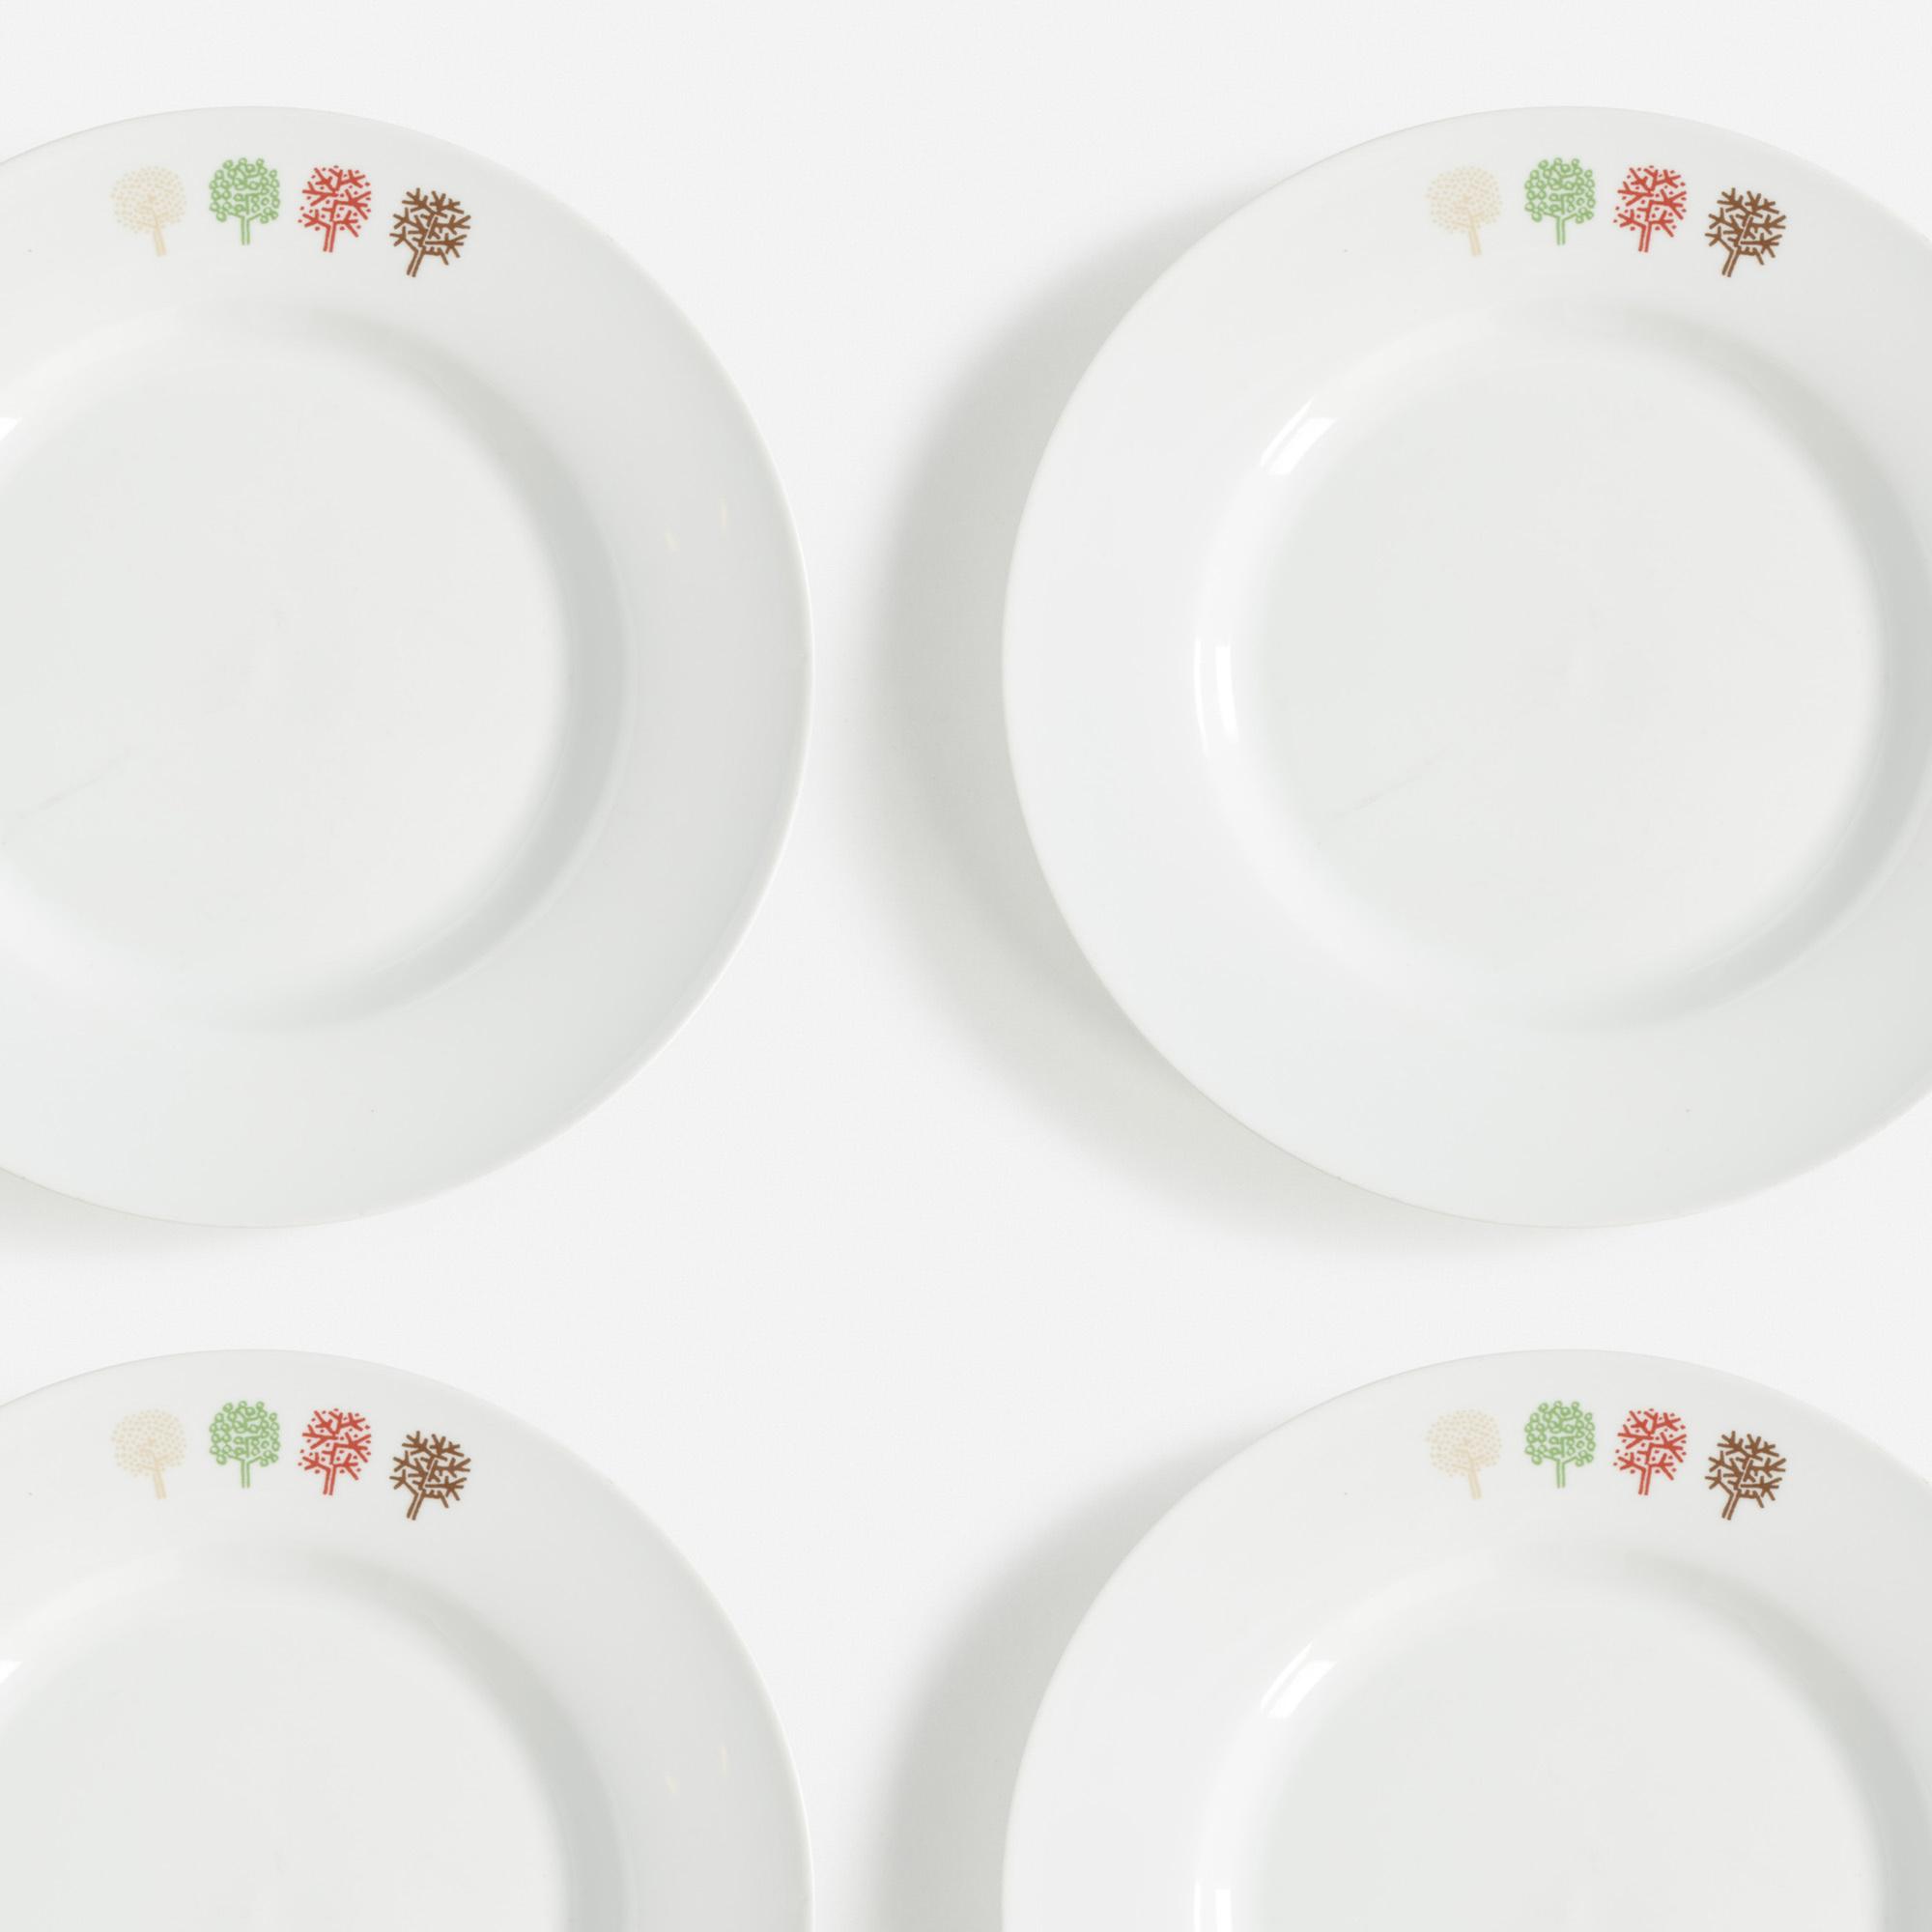 308:  / Four Seasons plates, set of twelve (1 of 1)